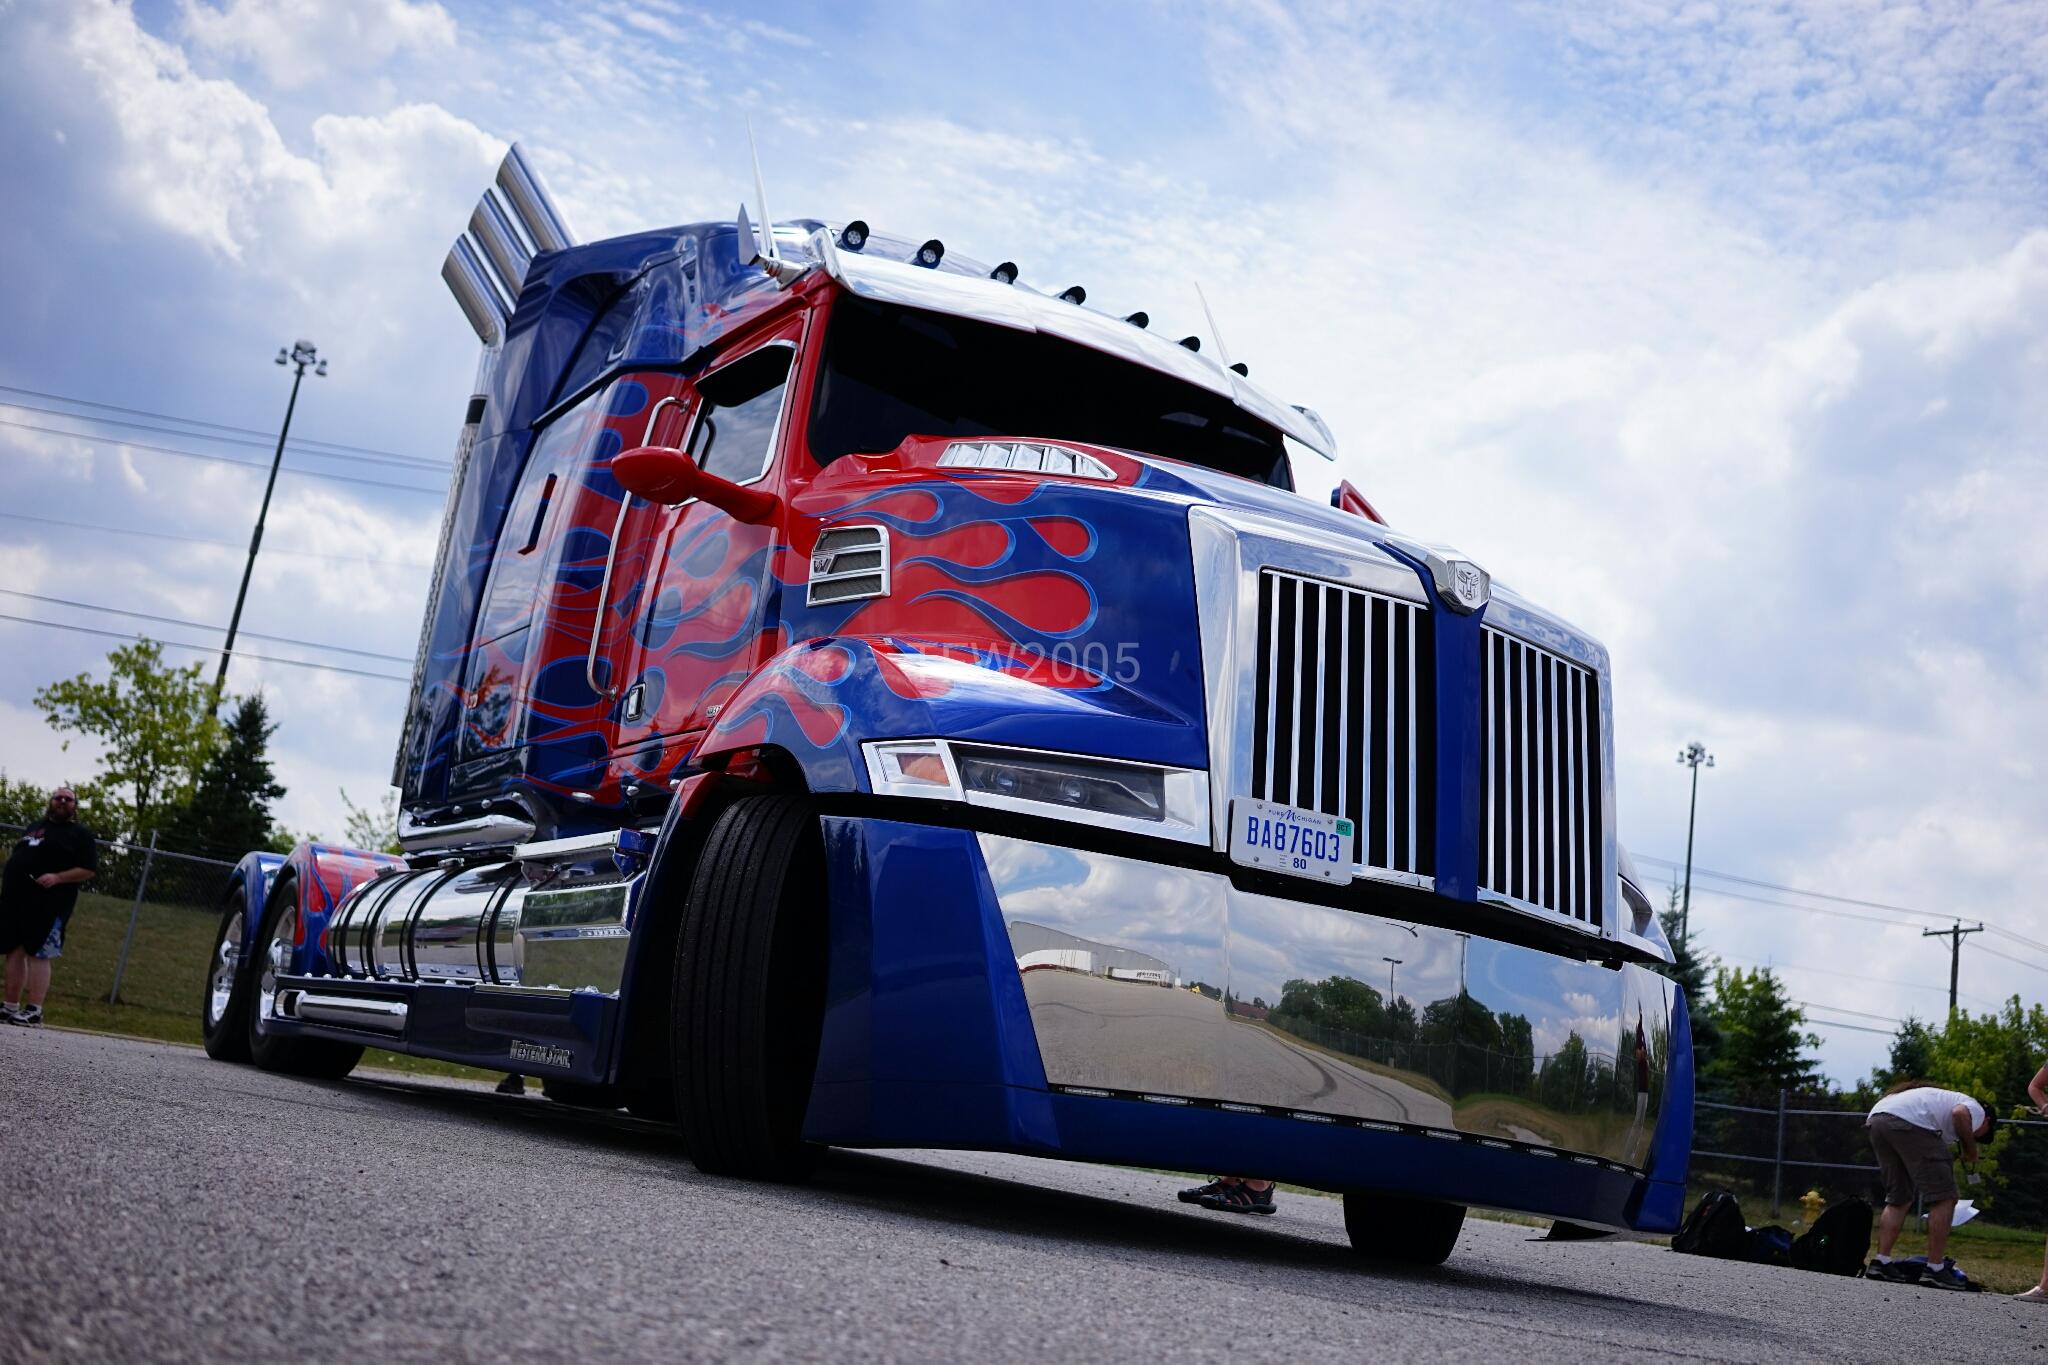 Car Transformer Live Wallpaper Transformers 5 Set Visit Optimus Prime Shines